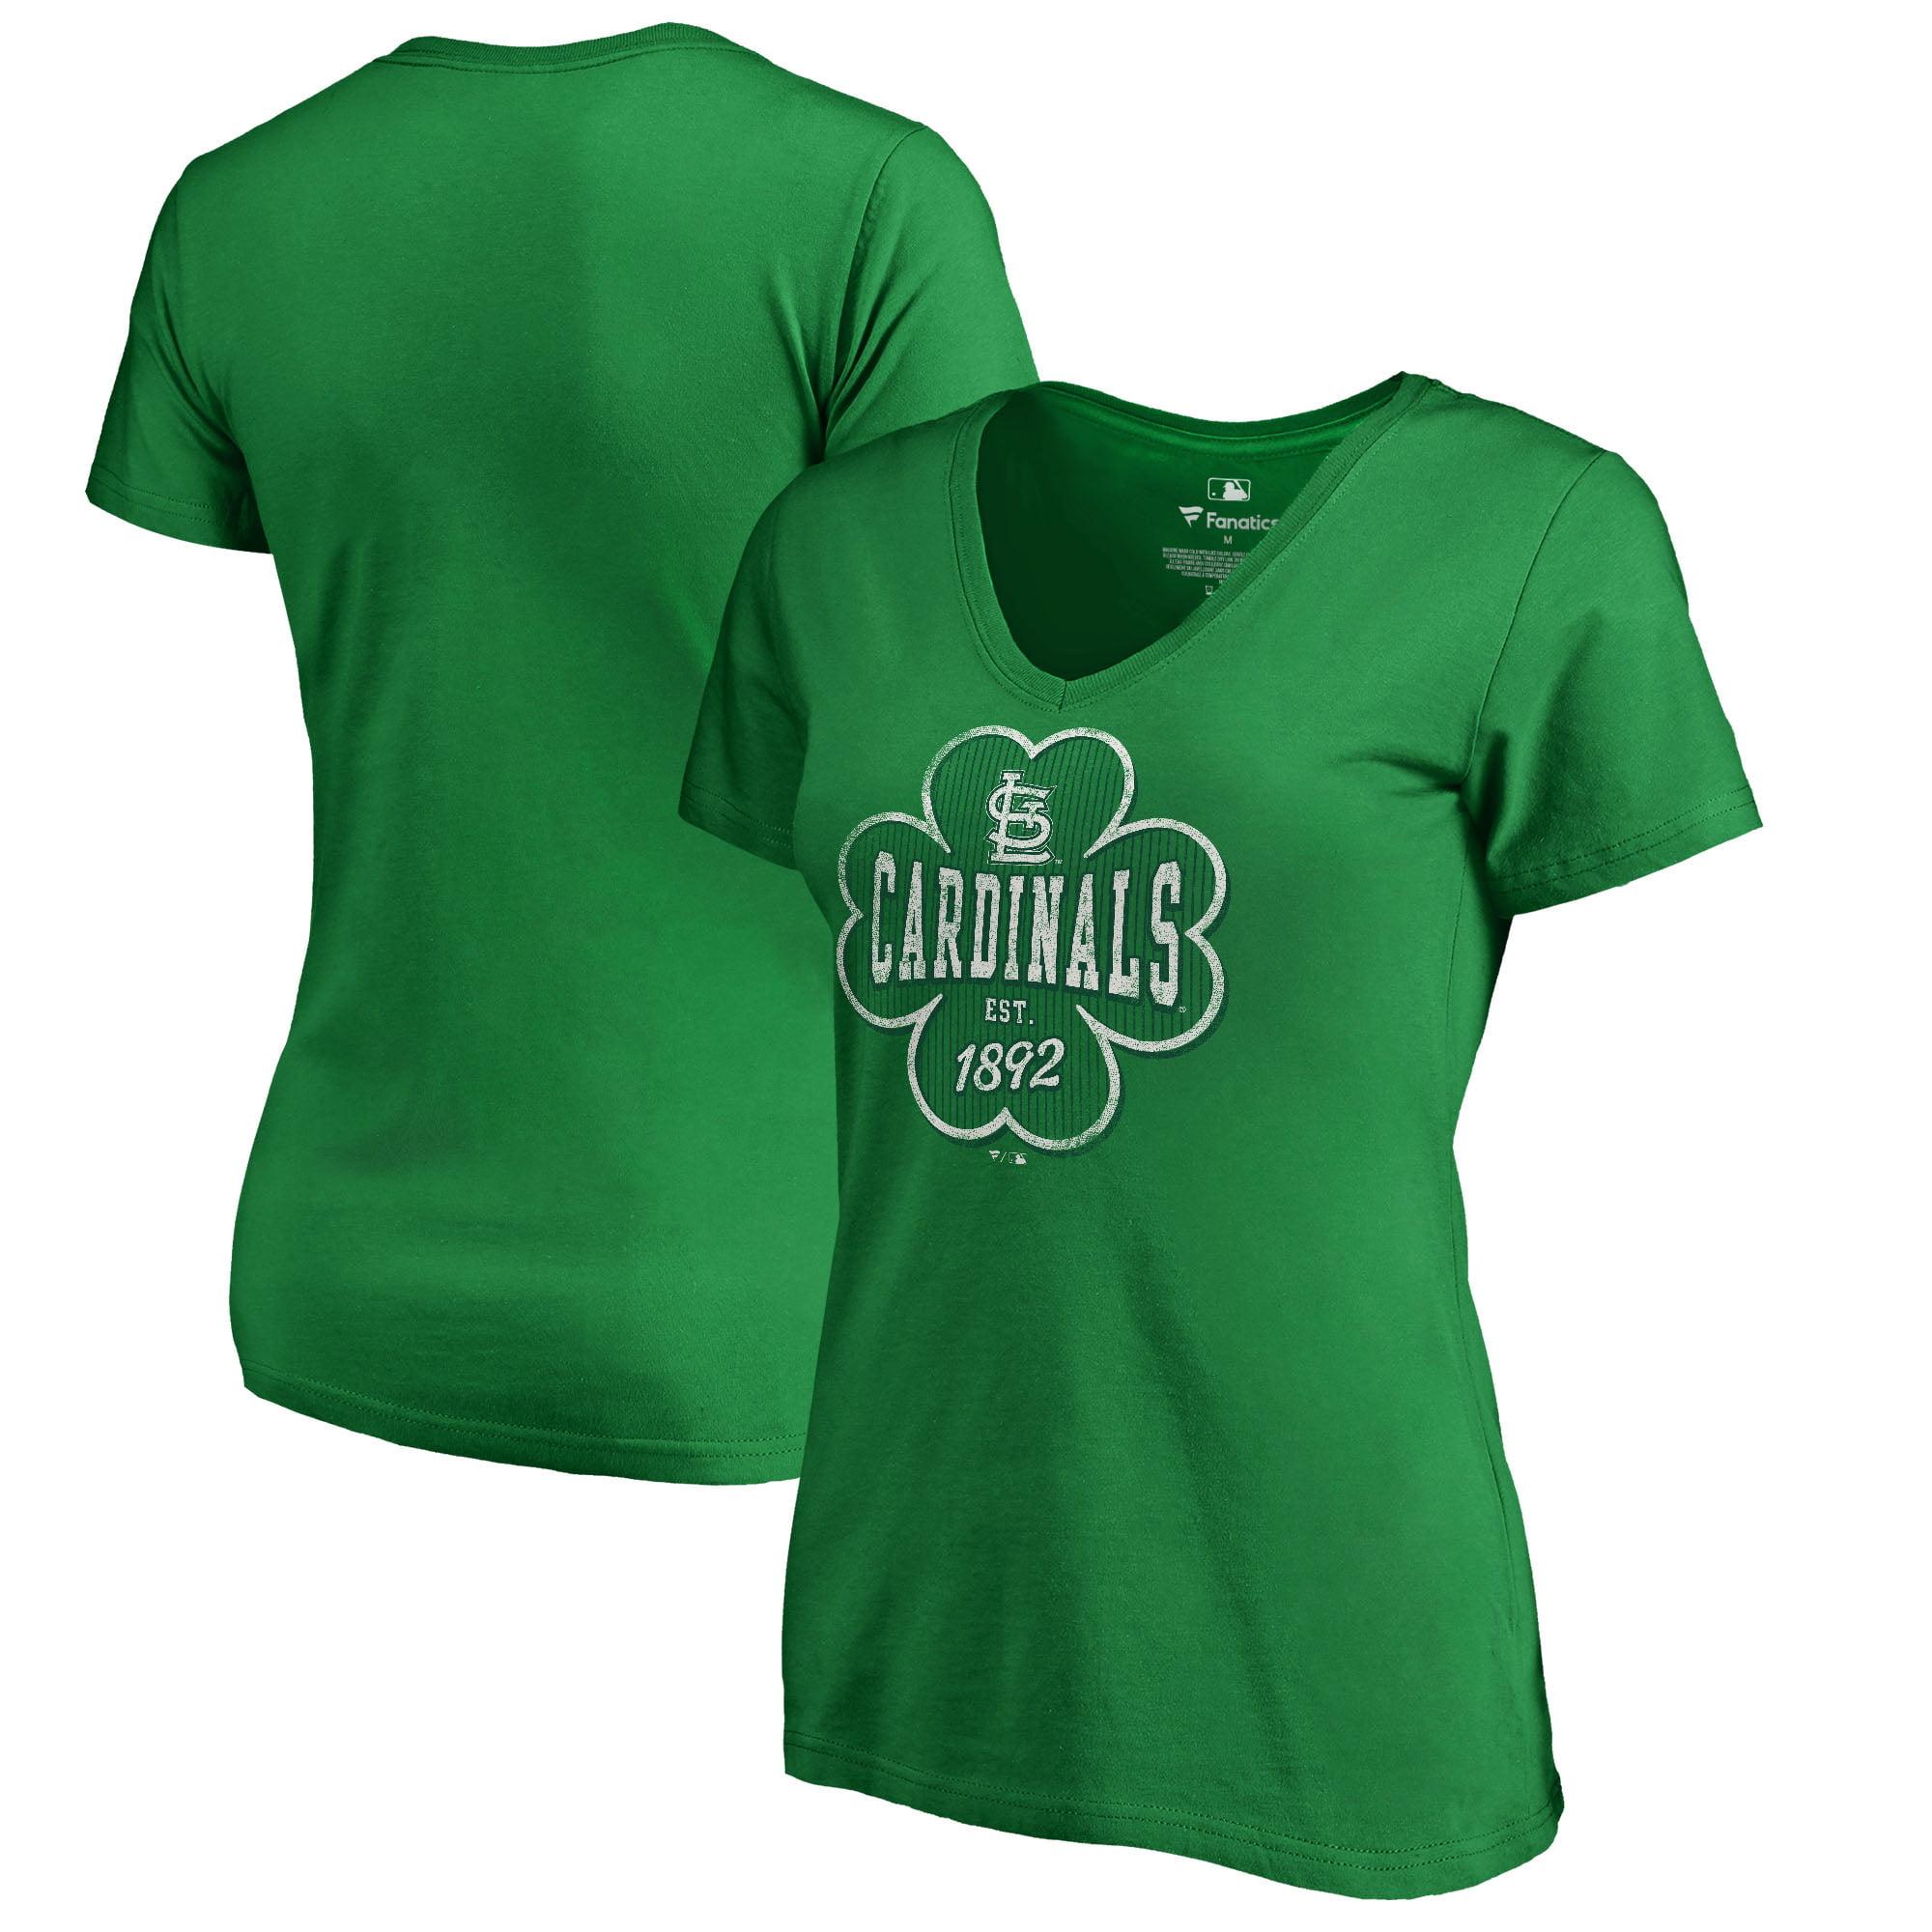 St. Louis Cardinals Fanatics Branded Women's 2018 St. Patrick's Day Emerald Isle Plus Size V-Neck T-Shirt - Kelly Green